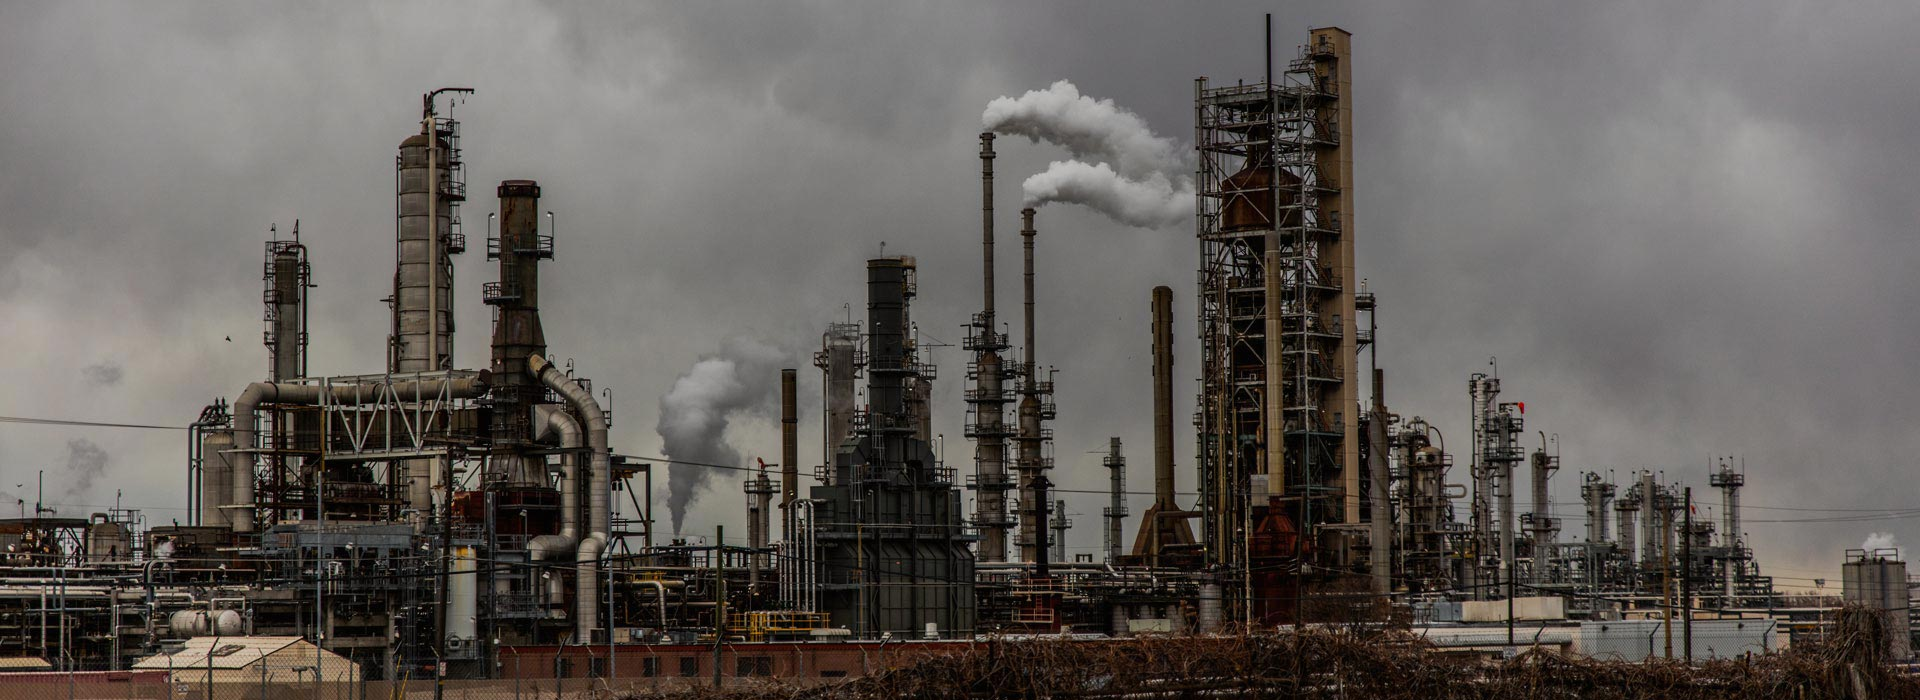 Projets Industrielles